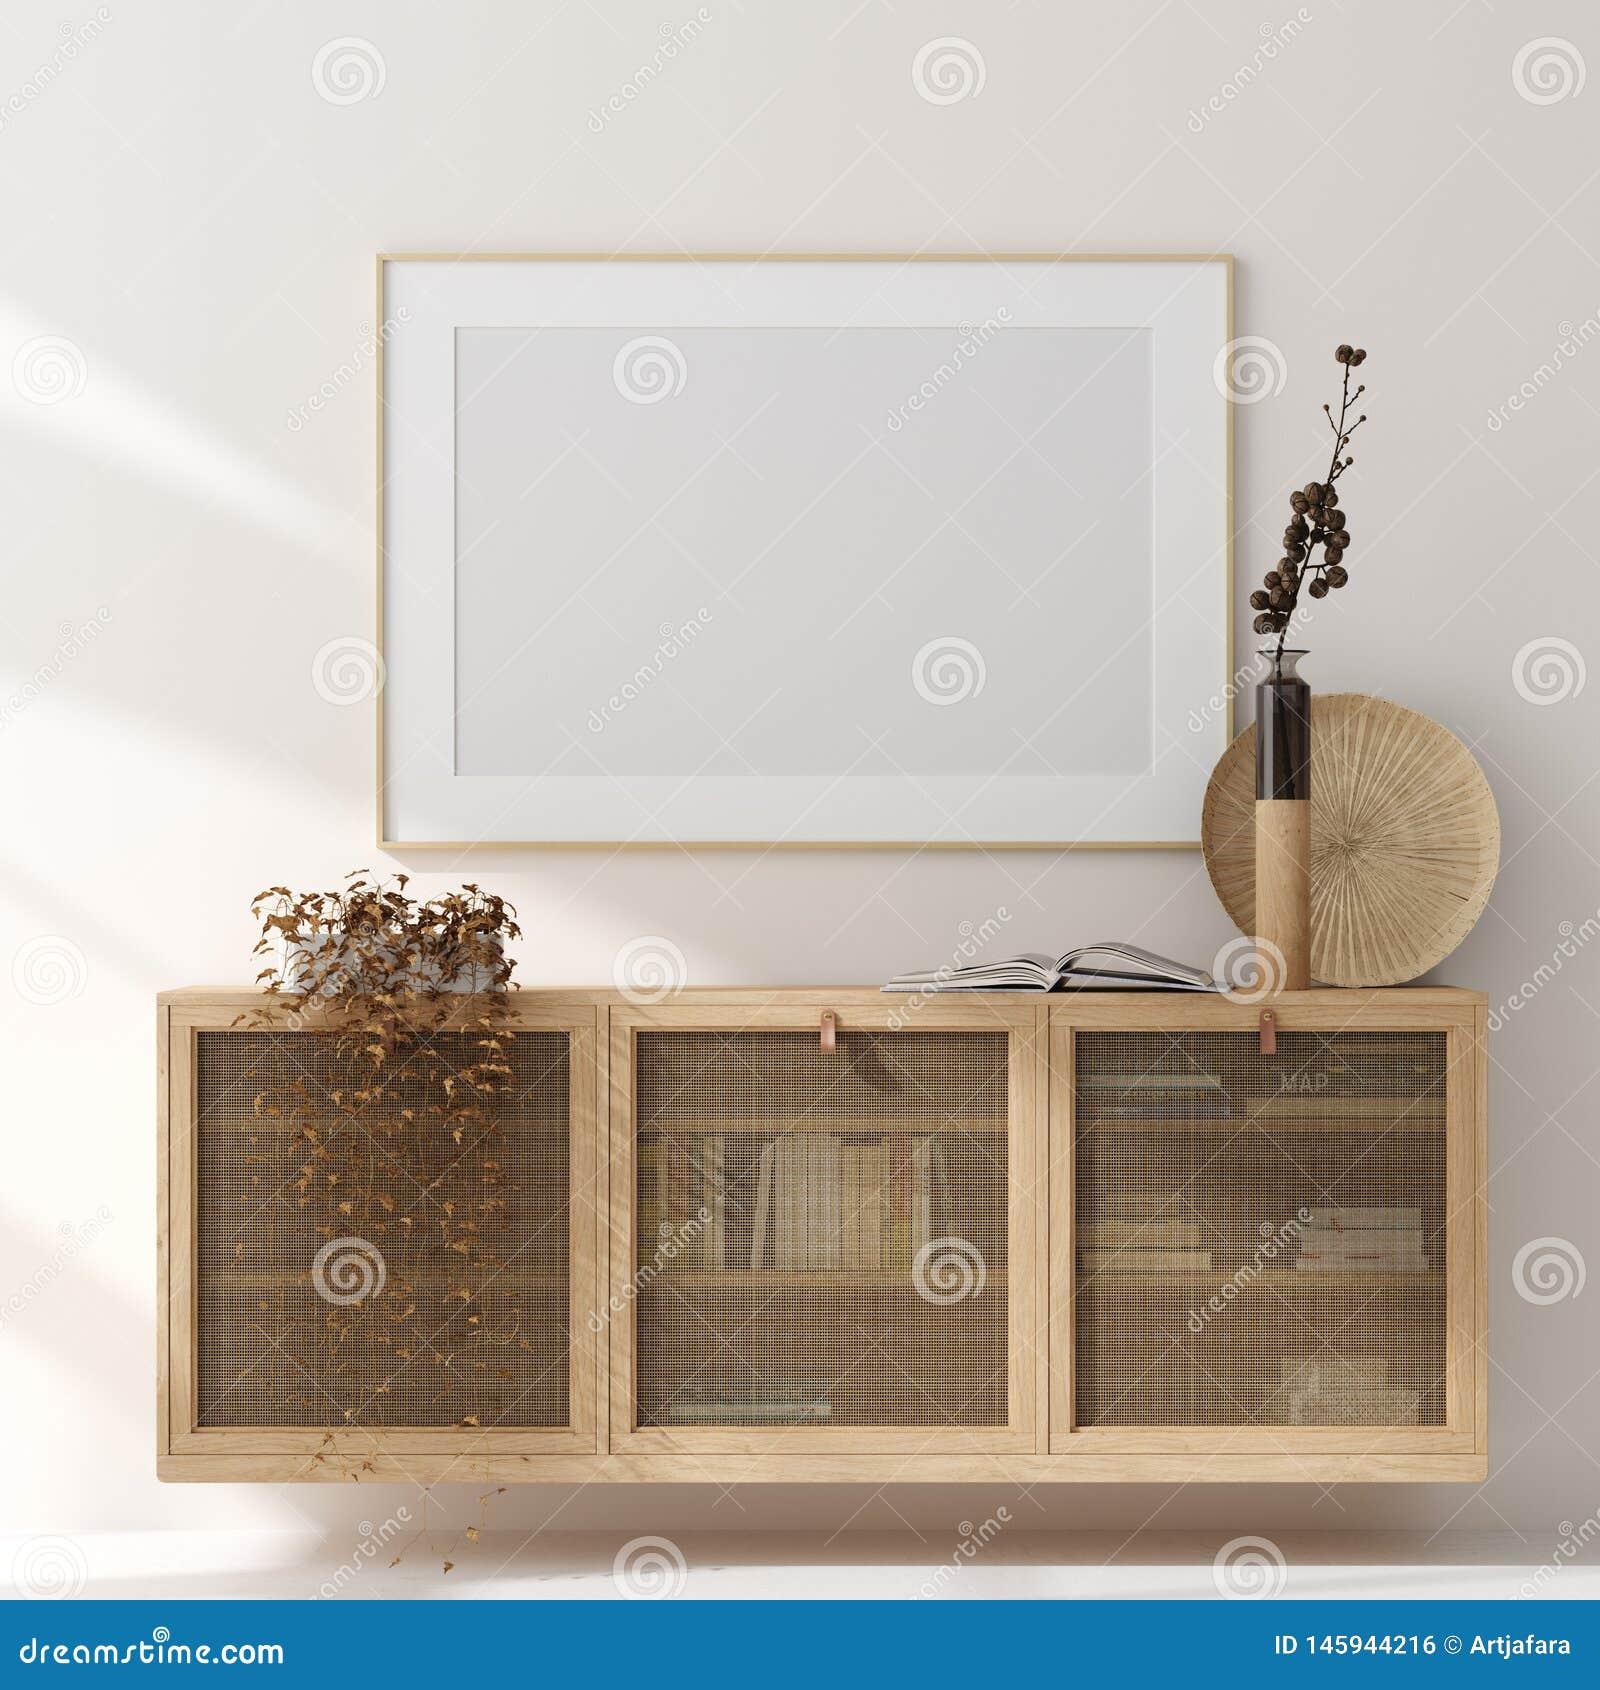 Falsk ?vre ram i hemmilj?bakgrund, beige rum med naturligt tr?m?blemang, skandinavisk stil